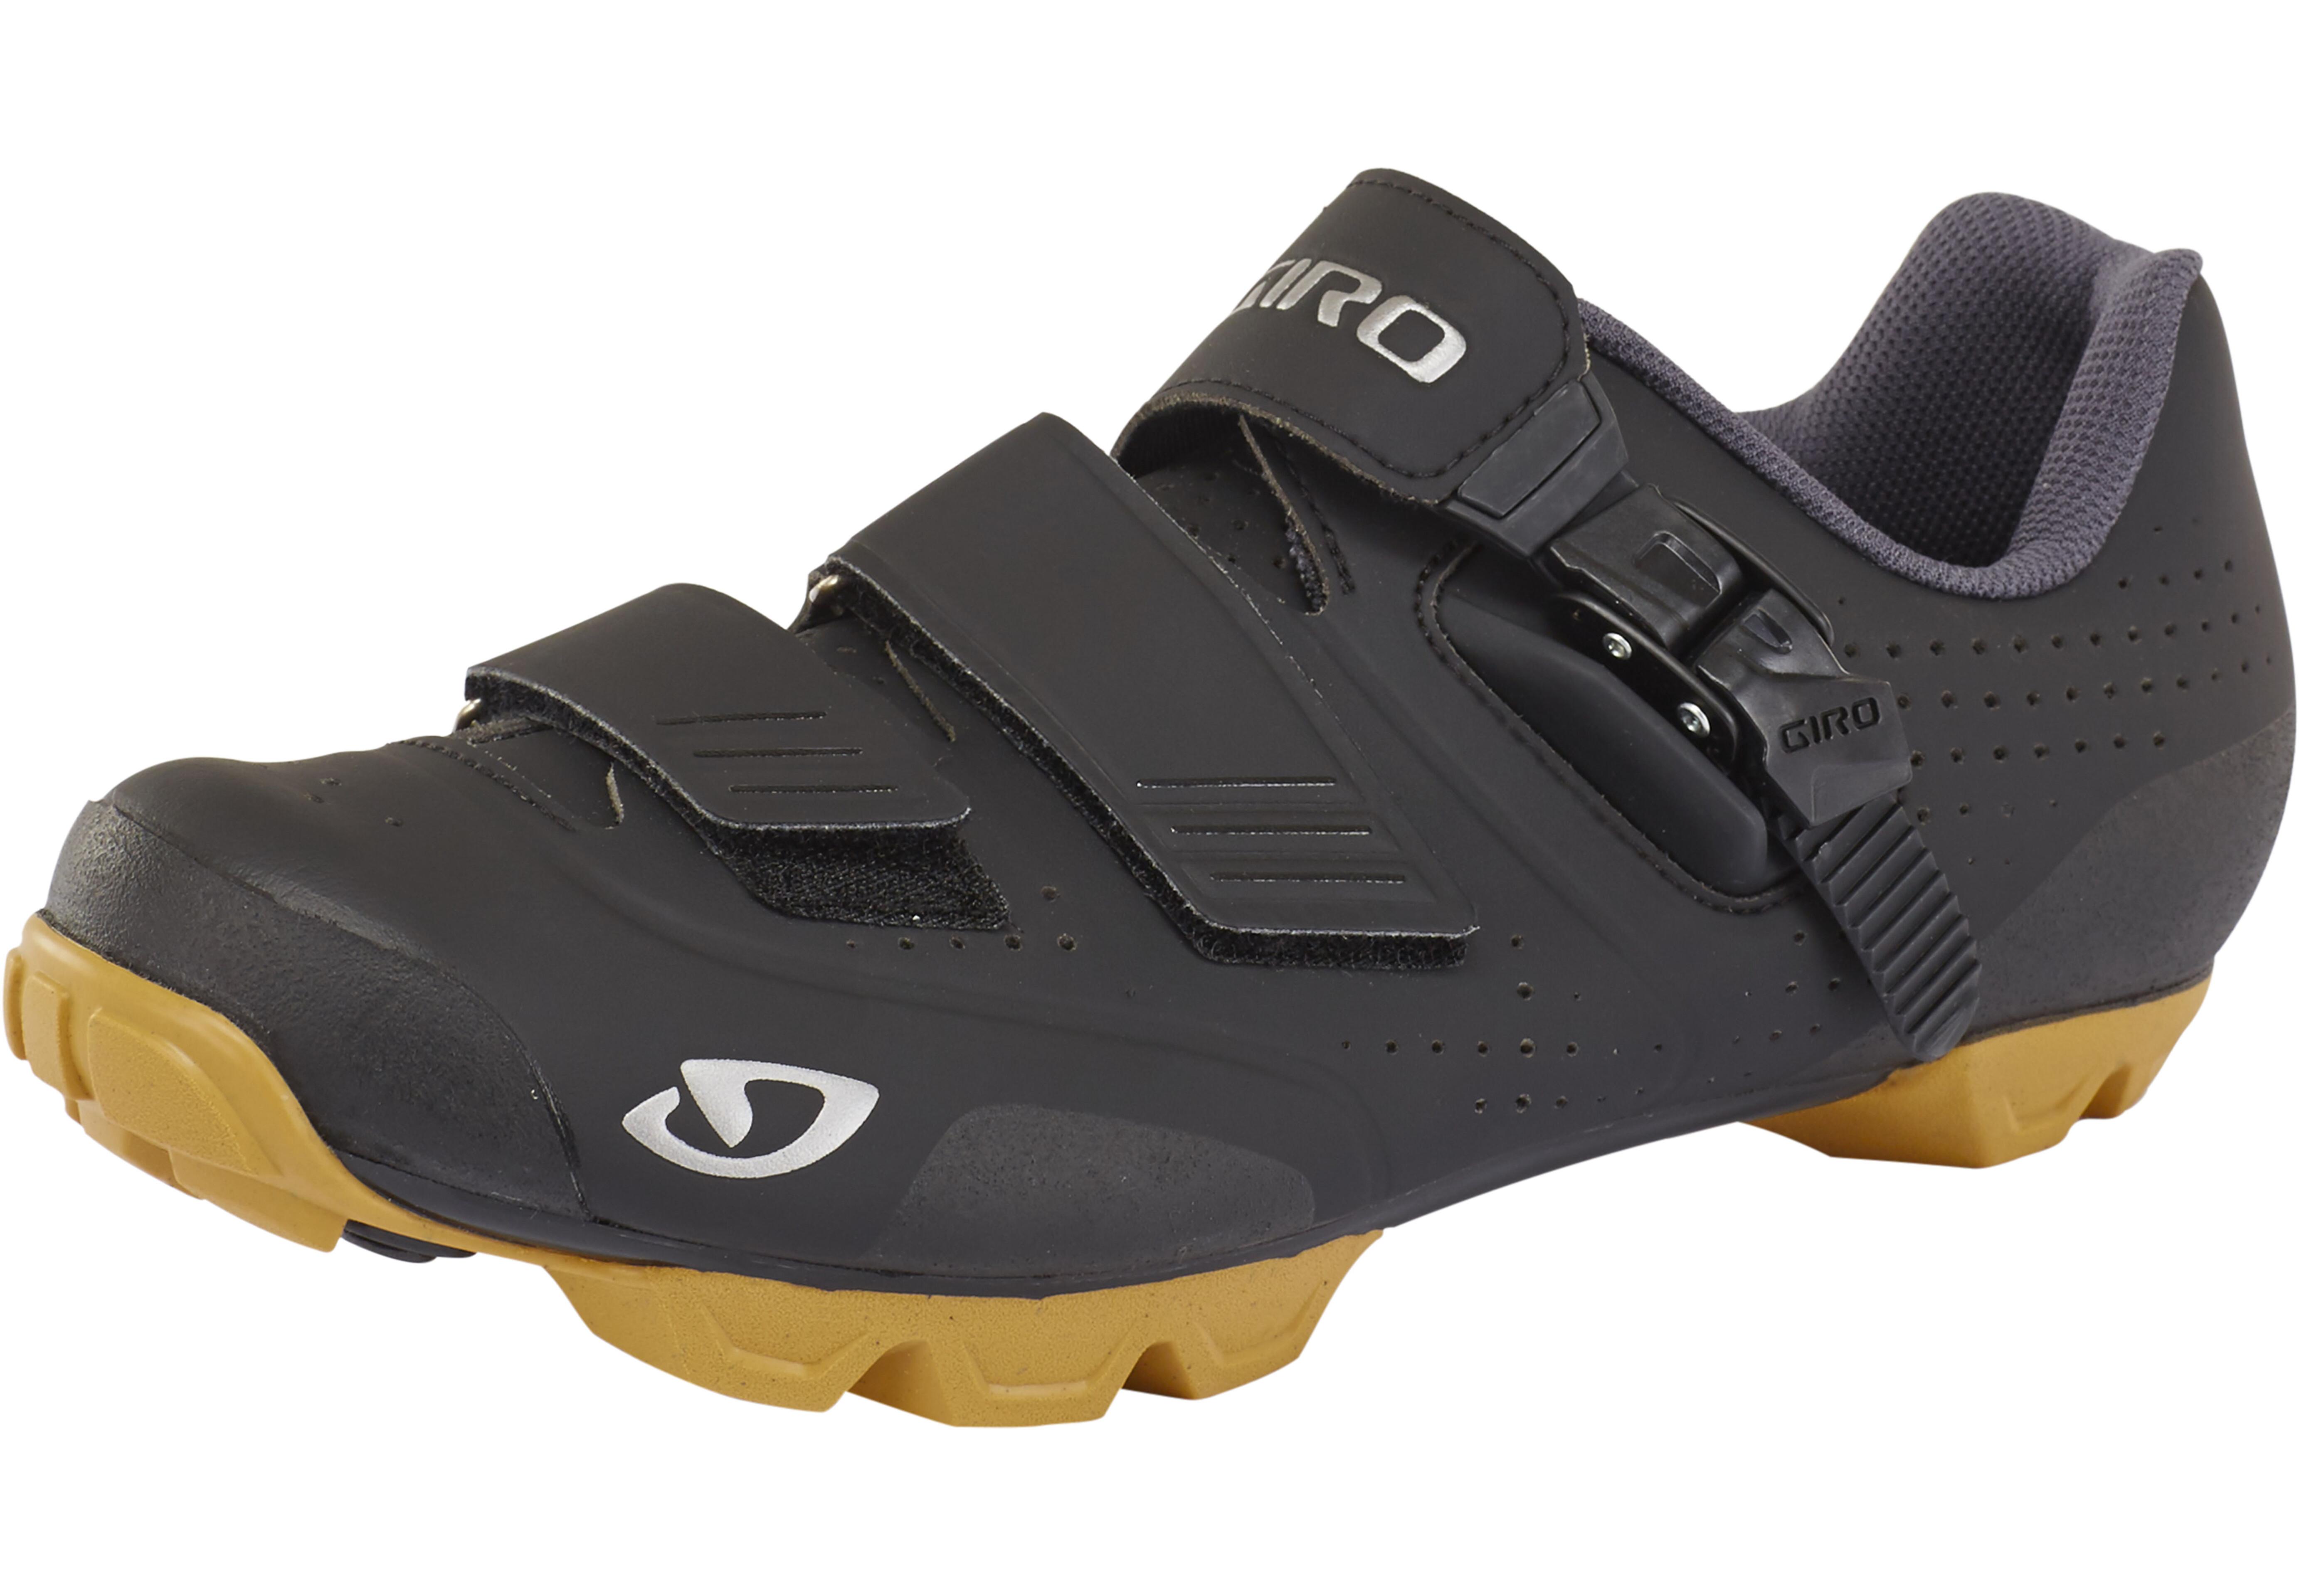 Giro Privateer Bike Shoes Men